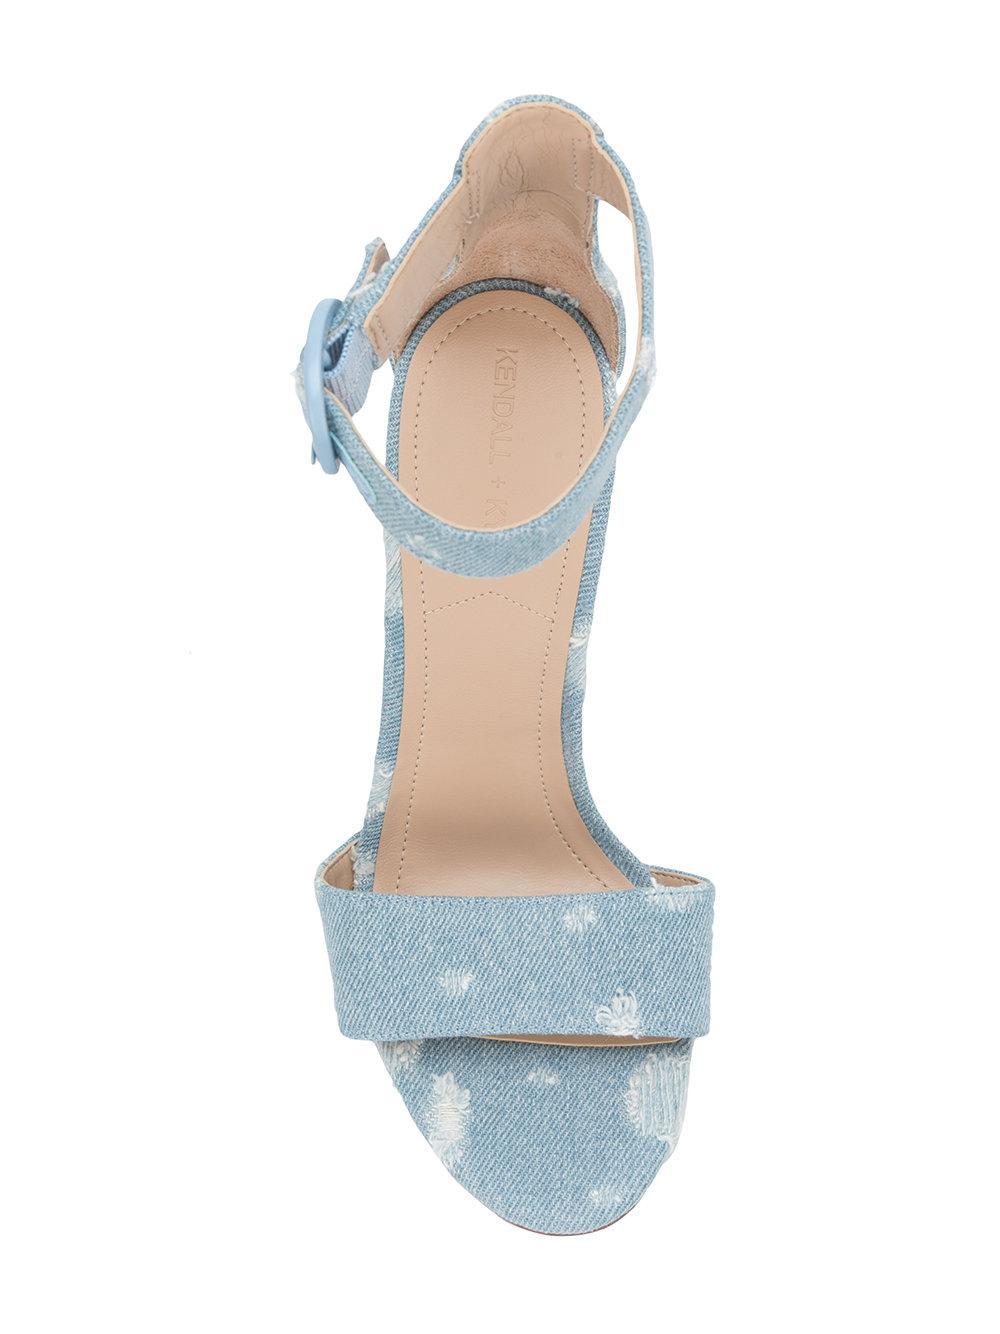 Sandales En Denim Détresse - Bleu + Kendall Kylie Q3xeSuJ